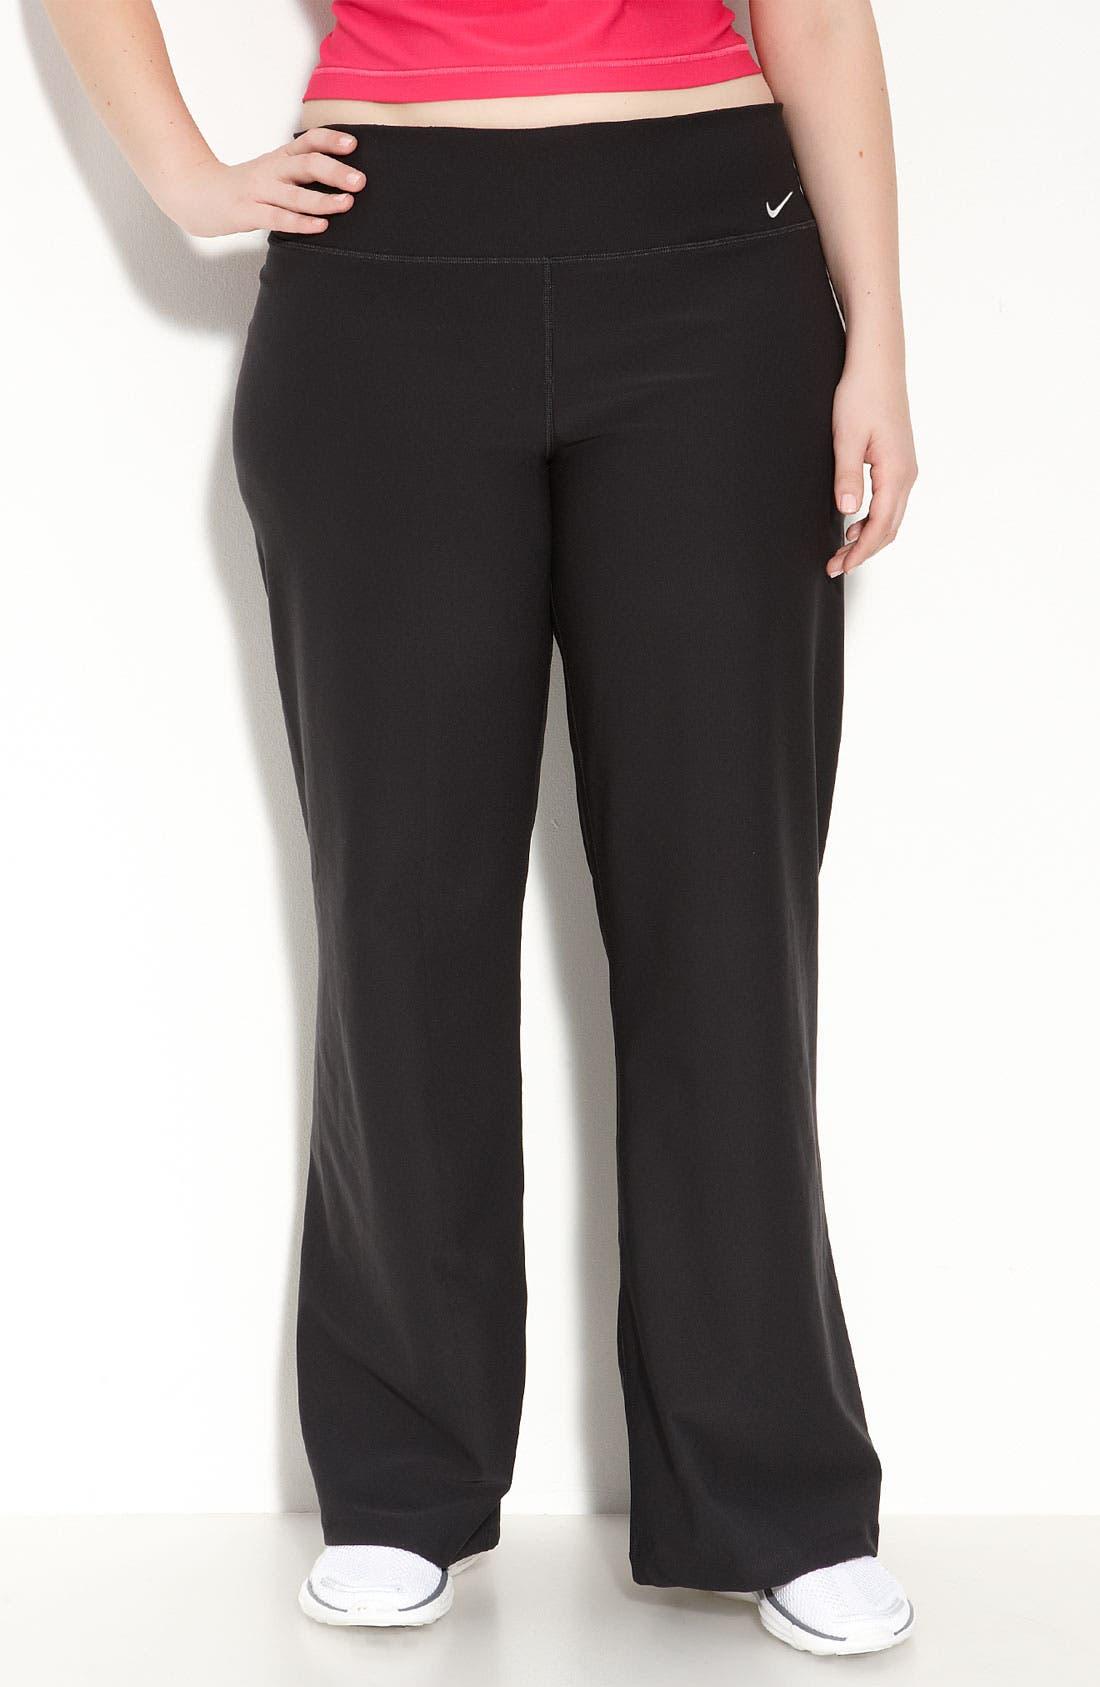 Alternate Image 1 Selected - Nike 'Legend' Pants (Plus Size)